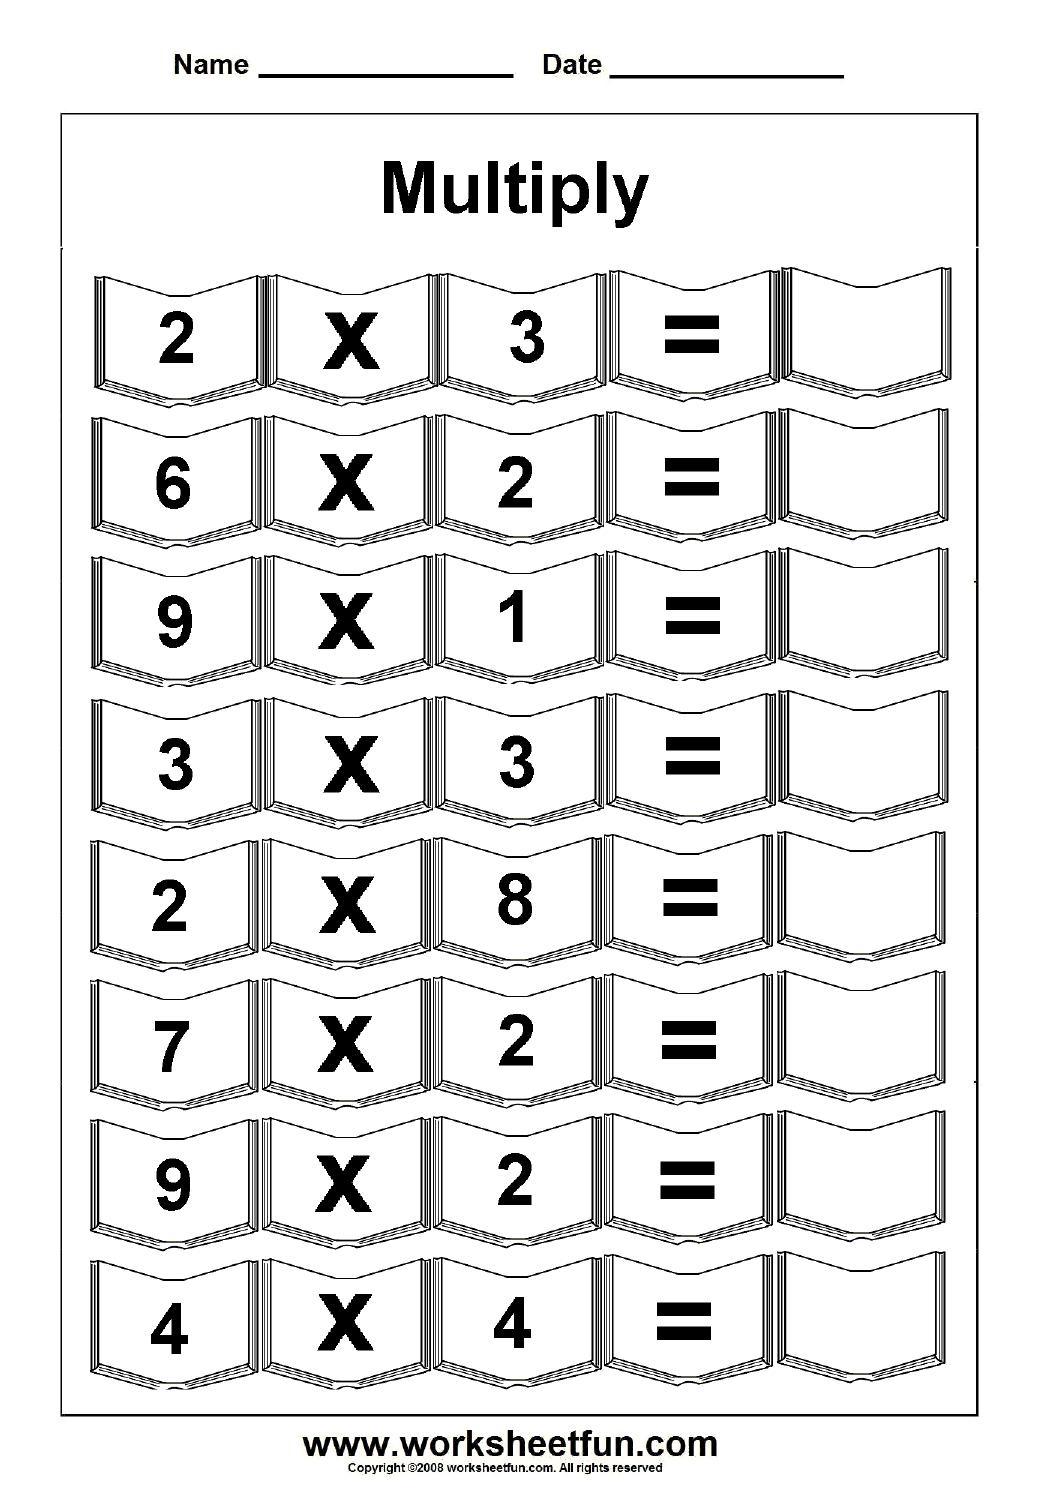 Multiplication – 5 Worksheets / Free Printable Worksheets – Worksheetfun - Free Printable 5 W's Worksheets